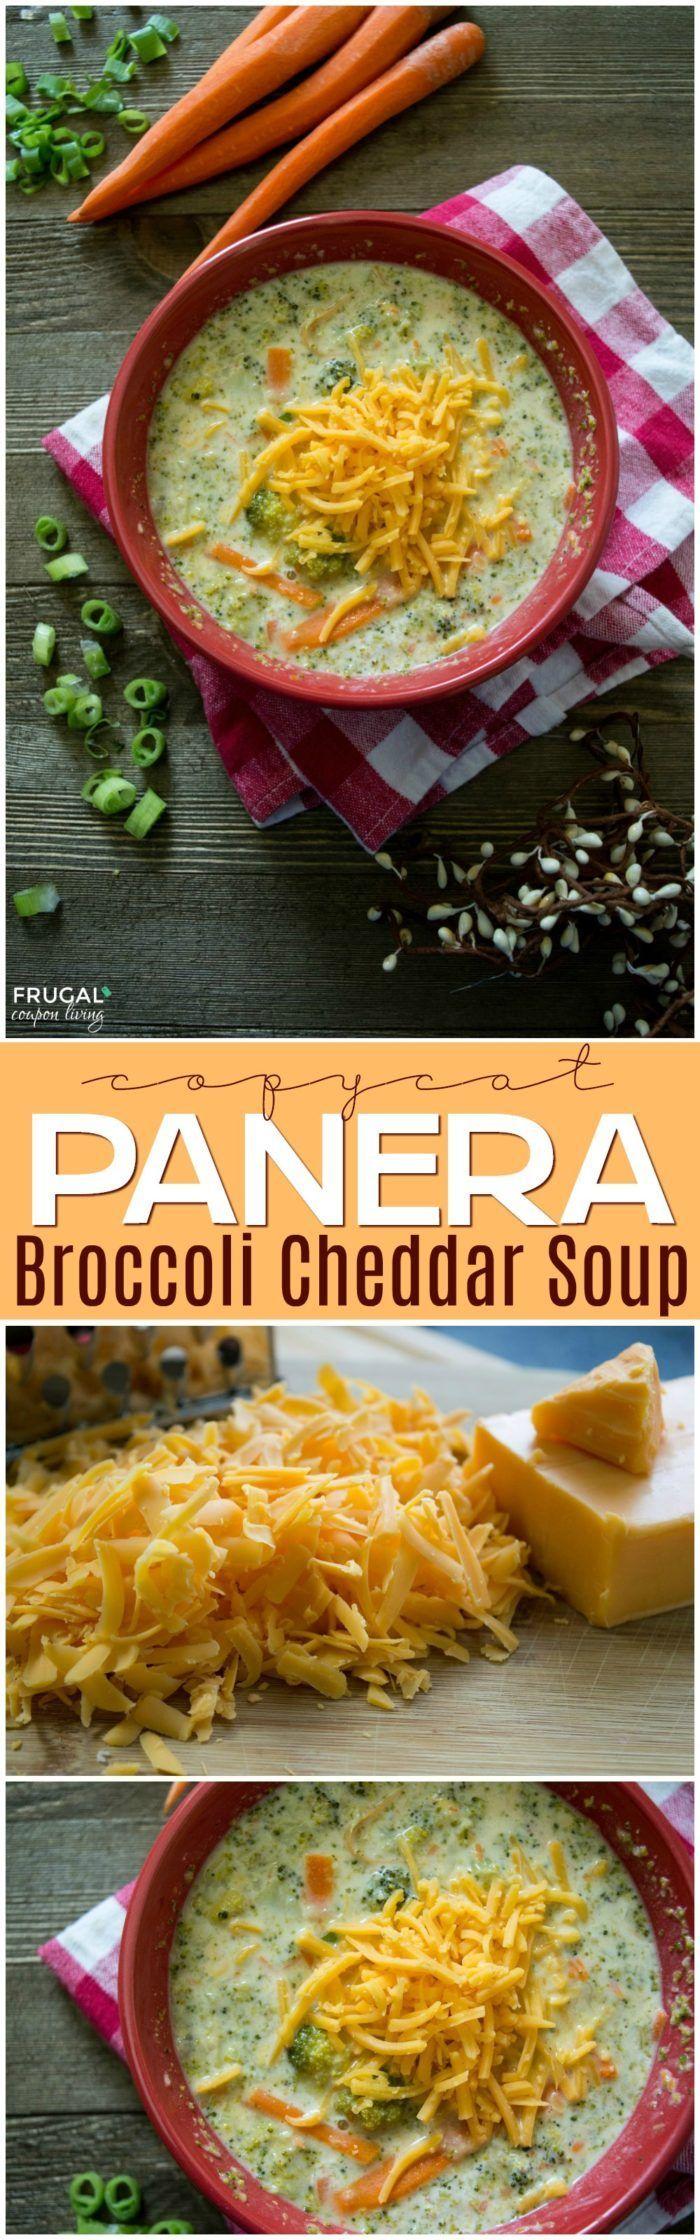 Copycat Panera Broccoli Cheddar Soup on Frugal Coupon Living. Comfort food recip...